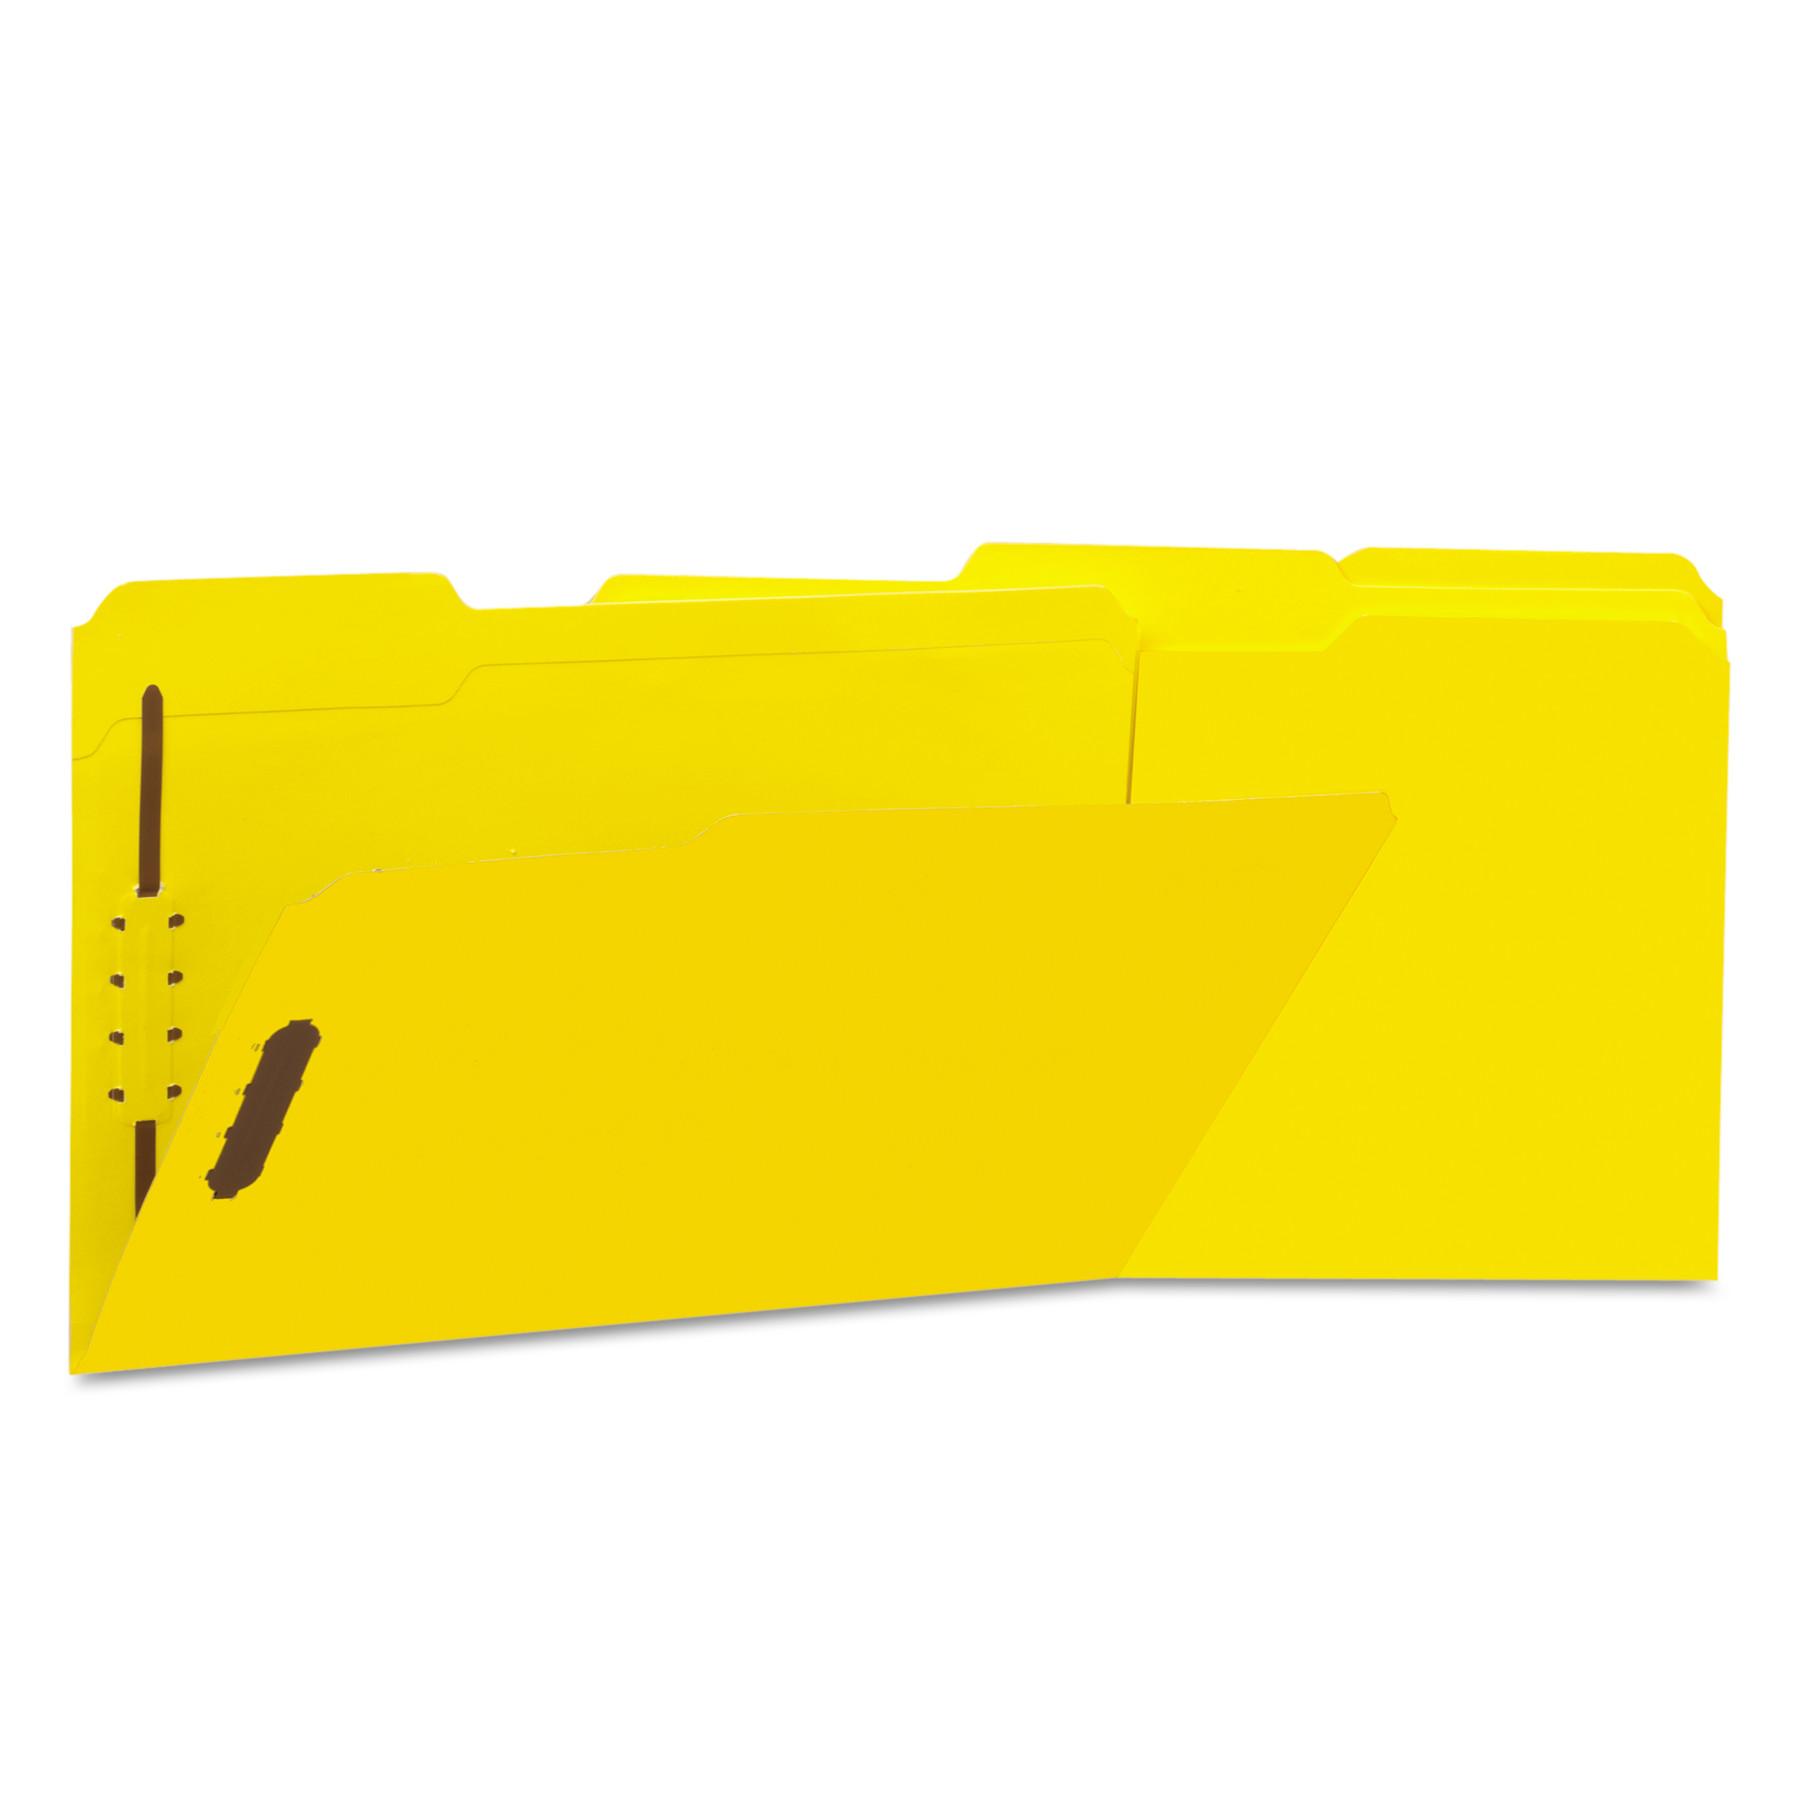 Deluxe Reinforced Top Tab Folders, 2 Fasteners, 1/3 Tab, Legal, Yellow, 50/Box